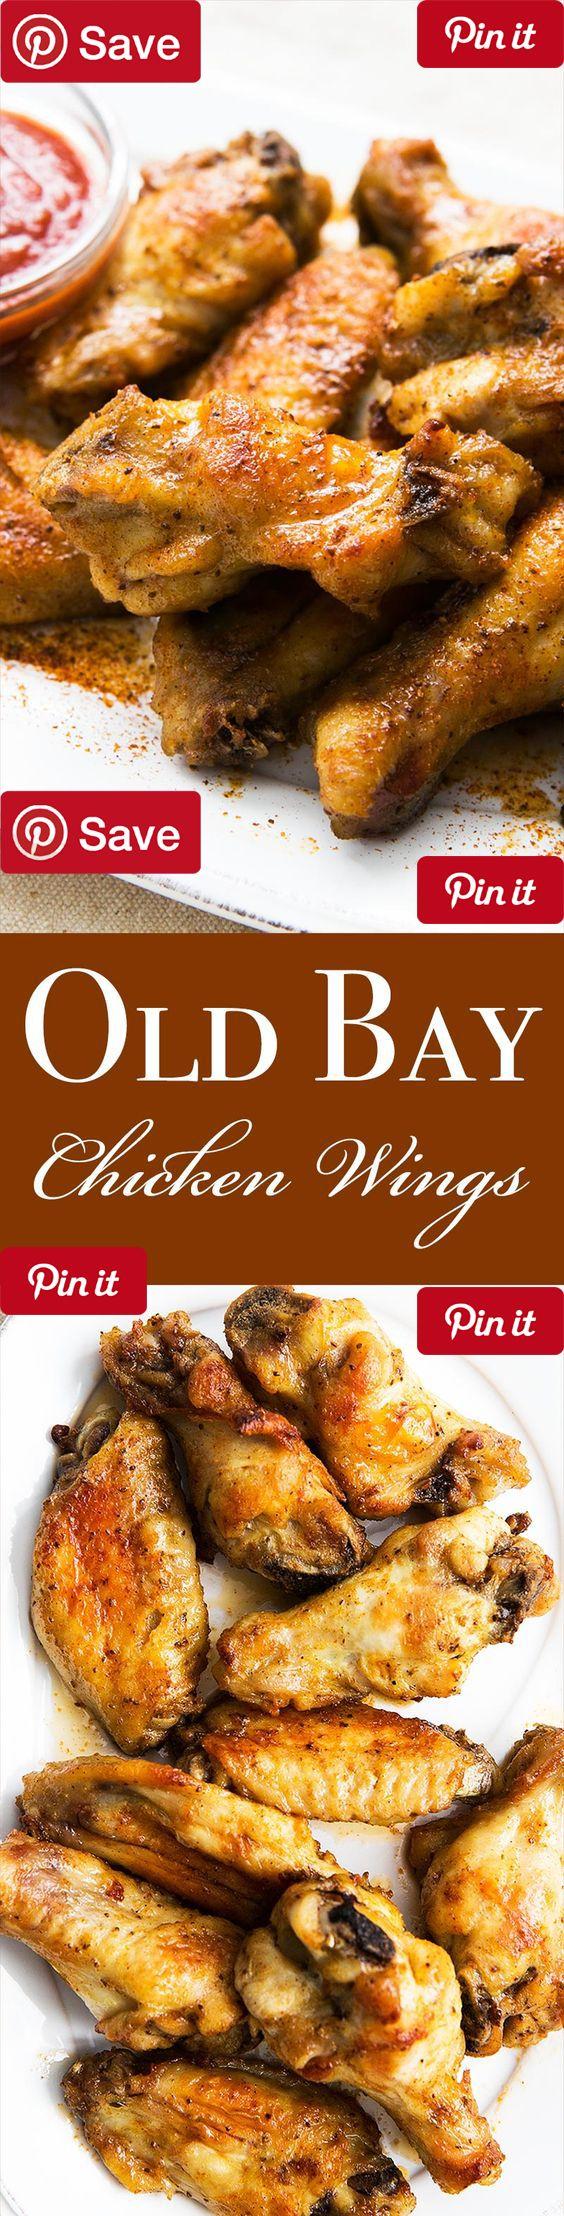 DIY Old Bay Chicken Wings- Ingredients Gluten free Meat 3 lbs Chicken wings Condiments 1 Cocktail sauce 1 tbsp Lemon juice Baking & Spices 1 tbsp Old bay seasoning Dairy 8 tbsp Butter, unsalted